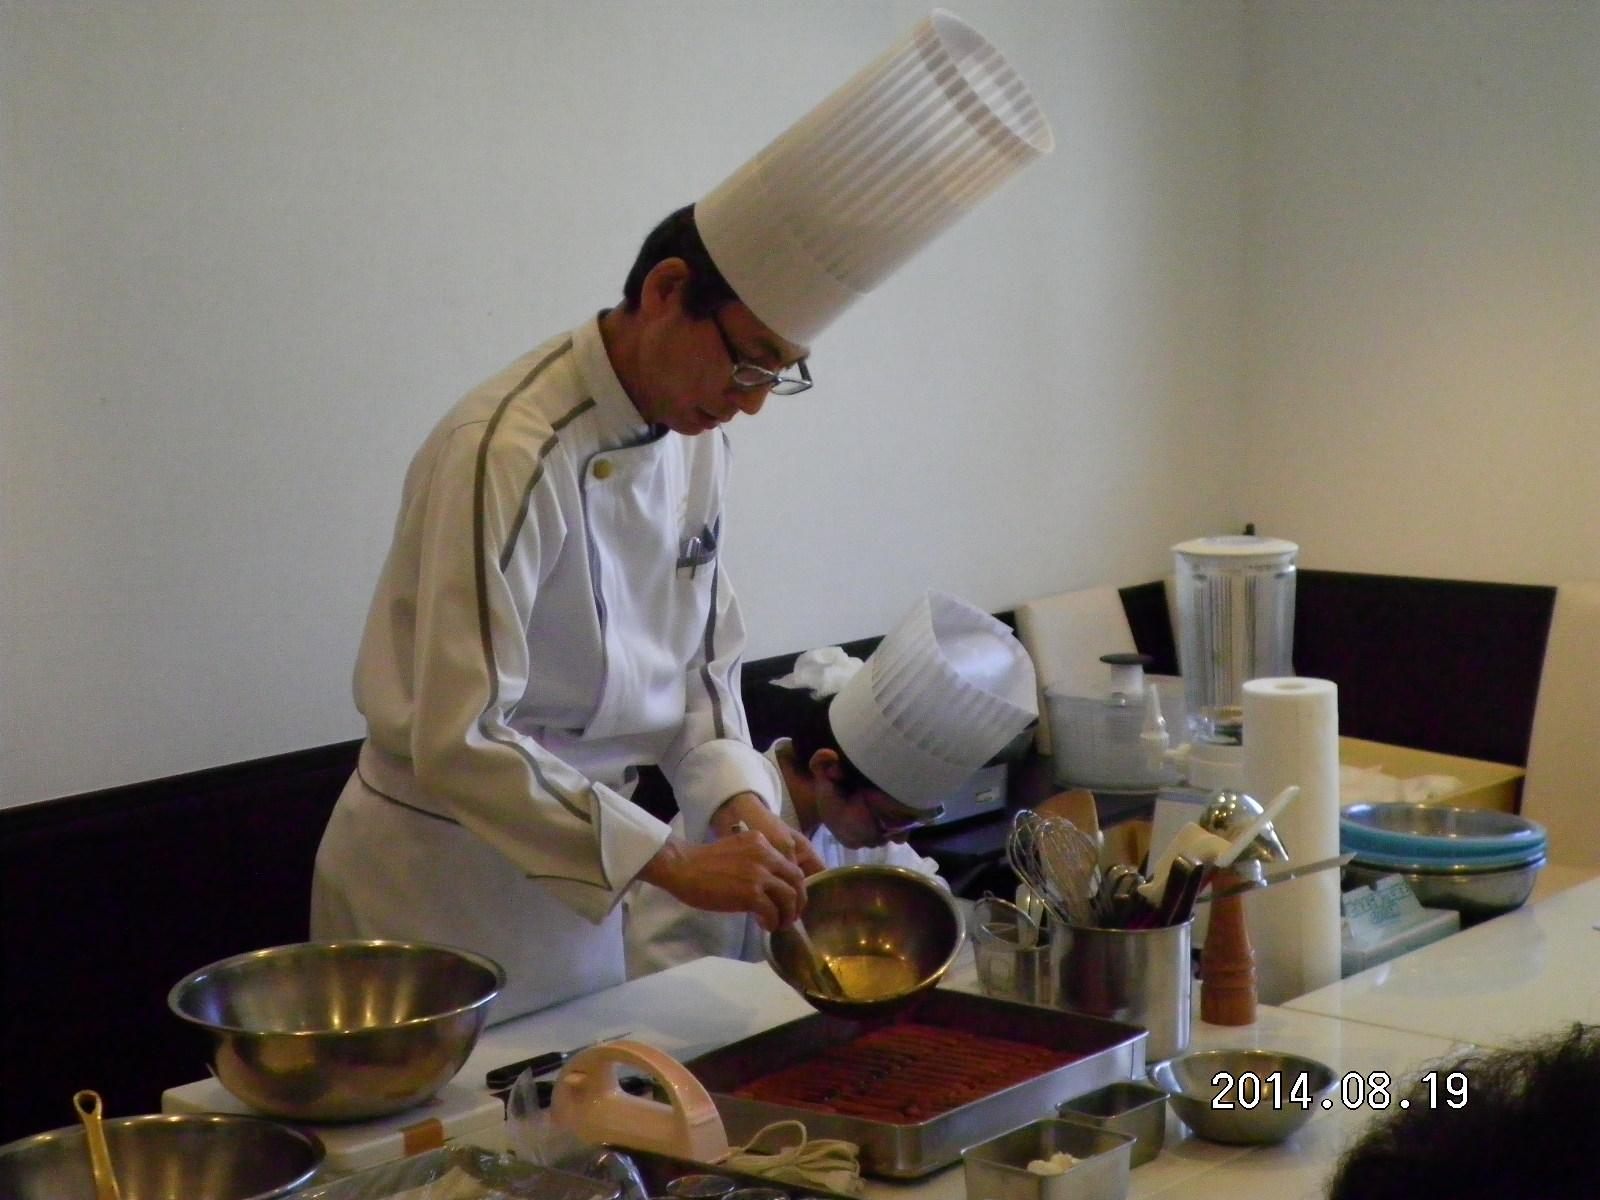 第43回お料理教室_e0190287_18425657.jpg